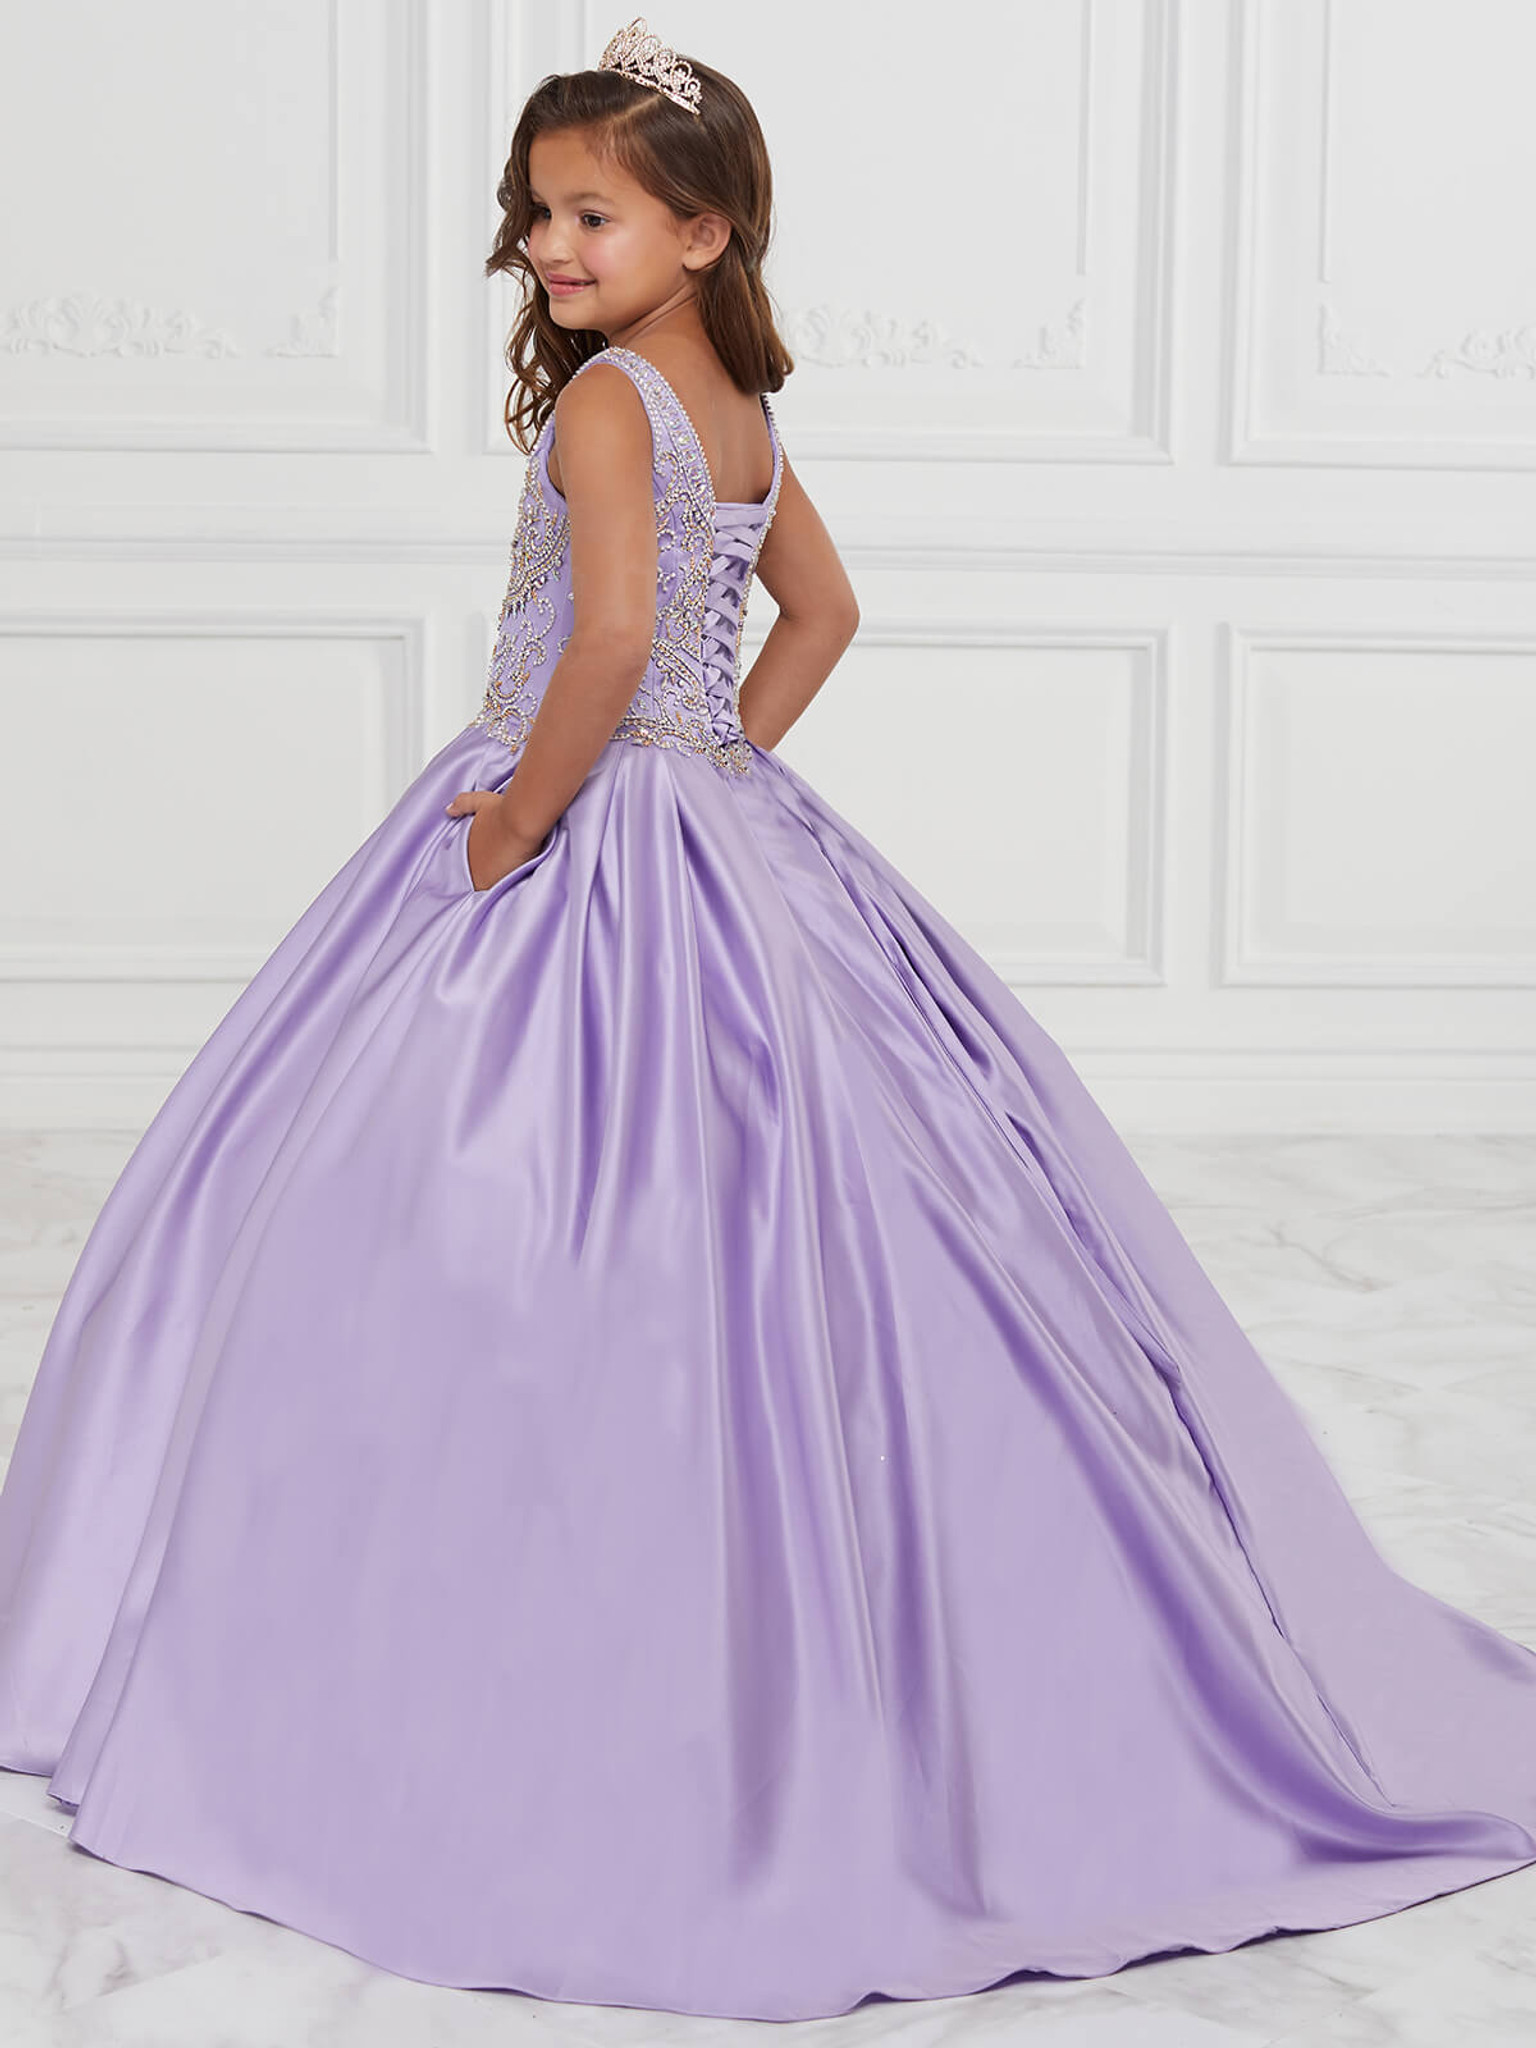 Scoop Neckline Girls Pageant Dress Tiffany Princess 13591